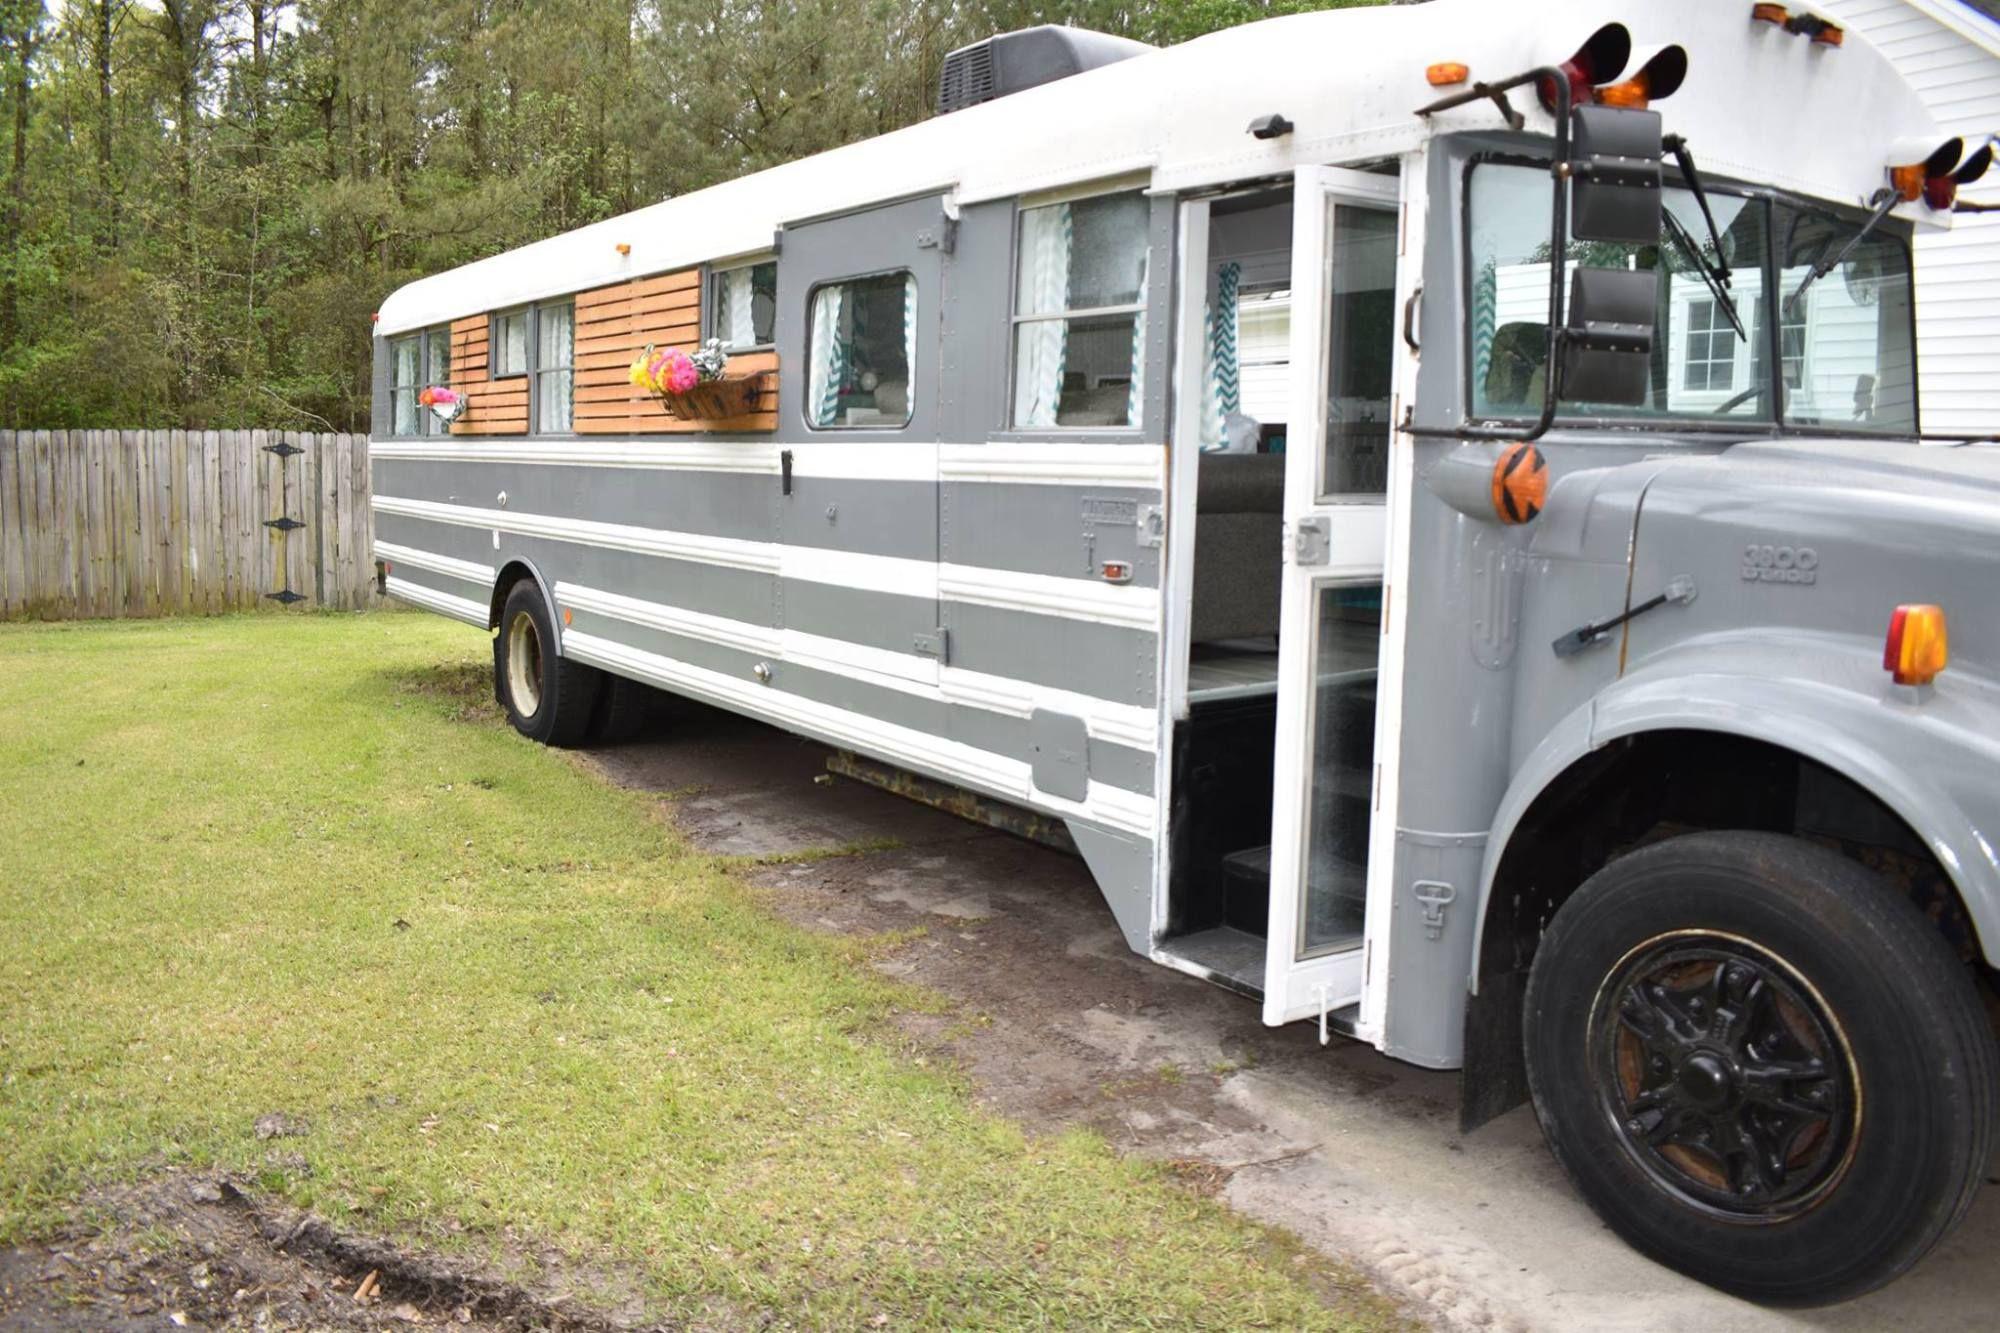 Remodeled School Bus Conversion (Skoolie) | Interior Design